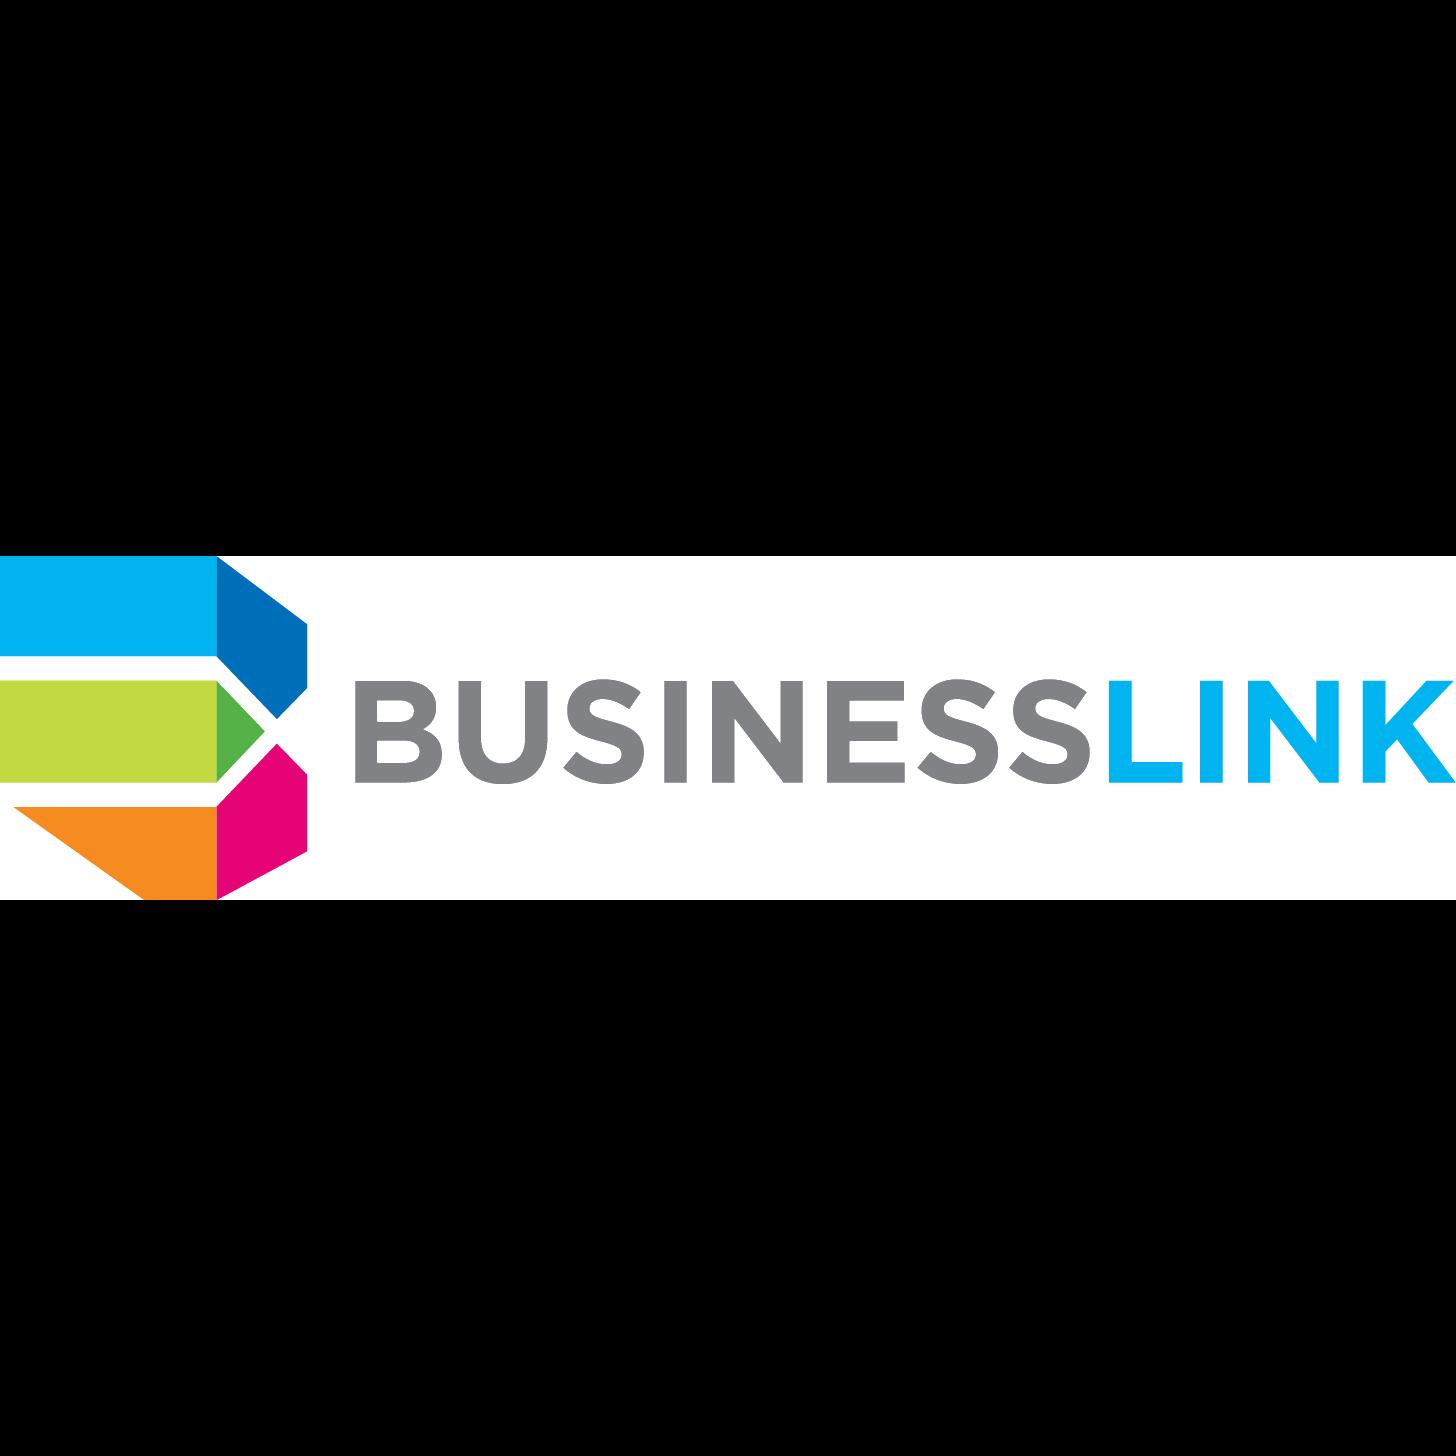 Business Link Alberta